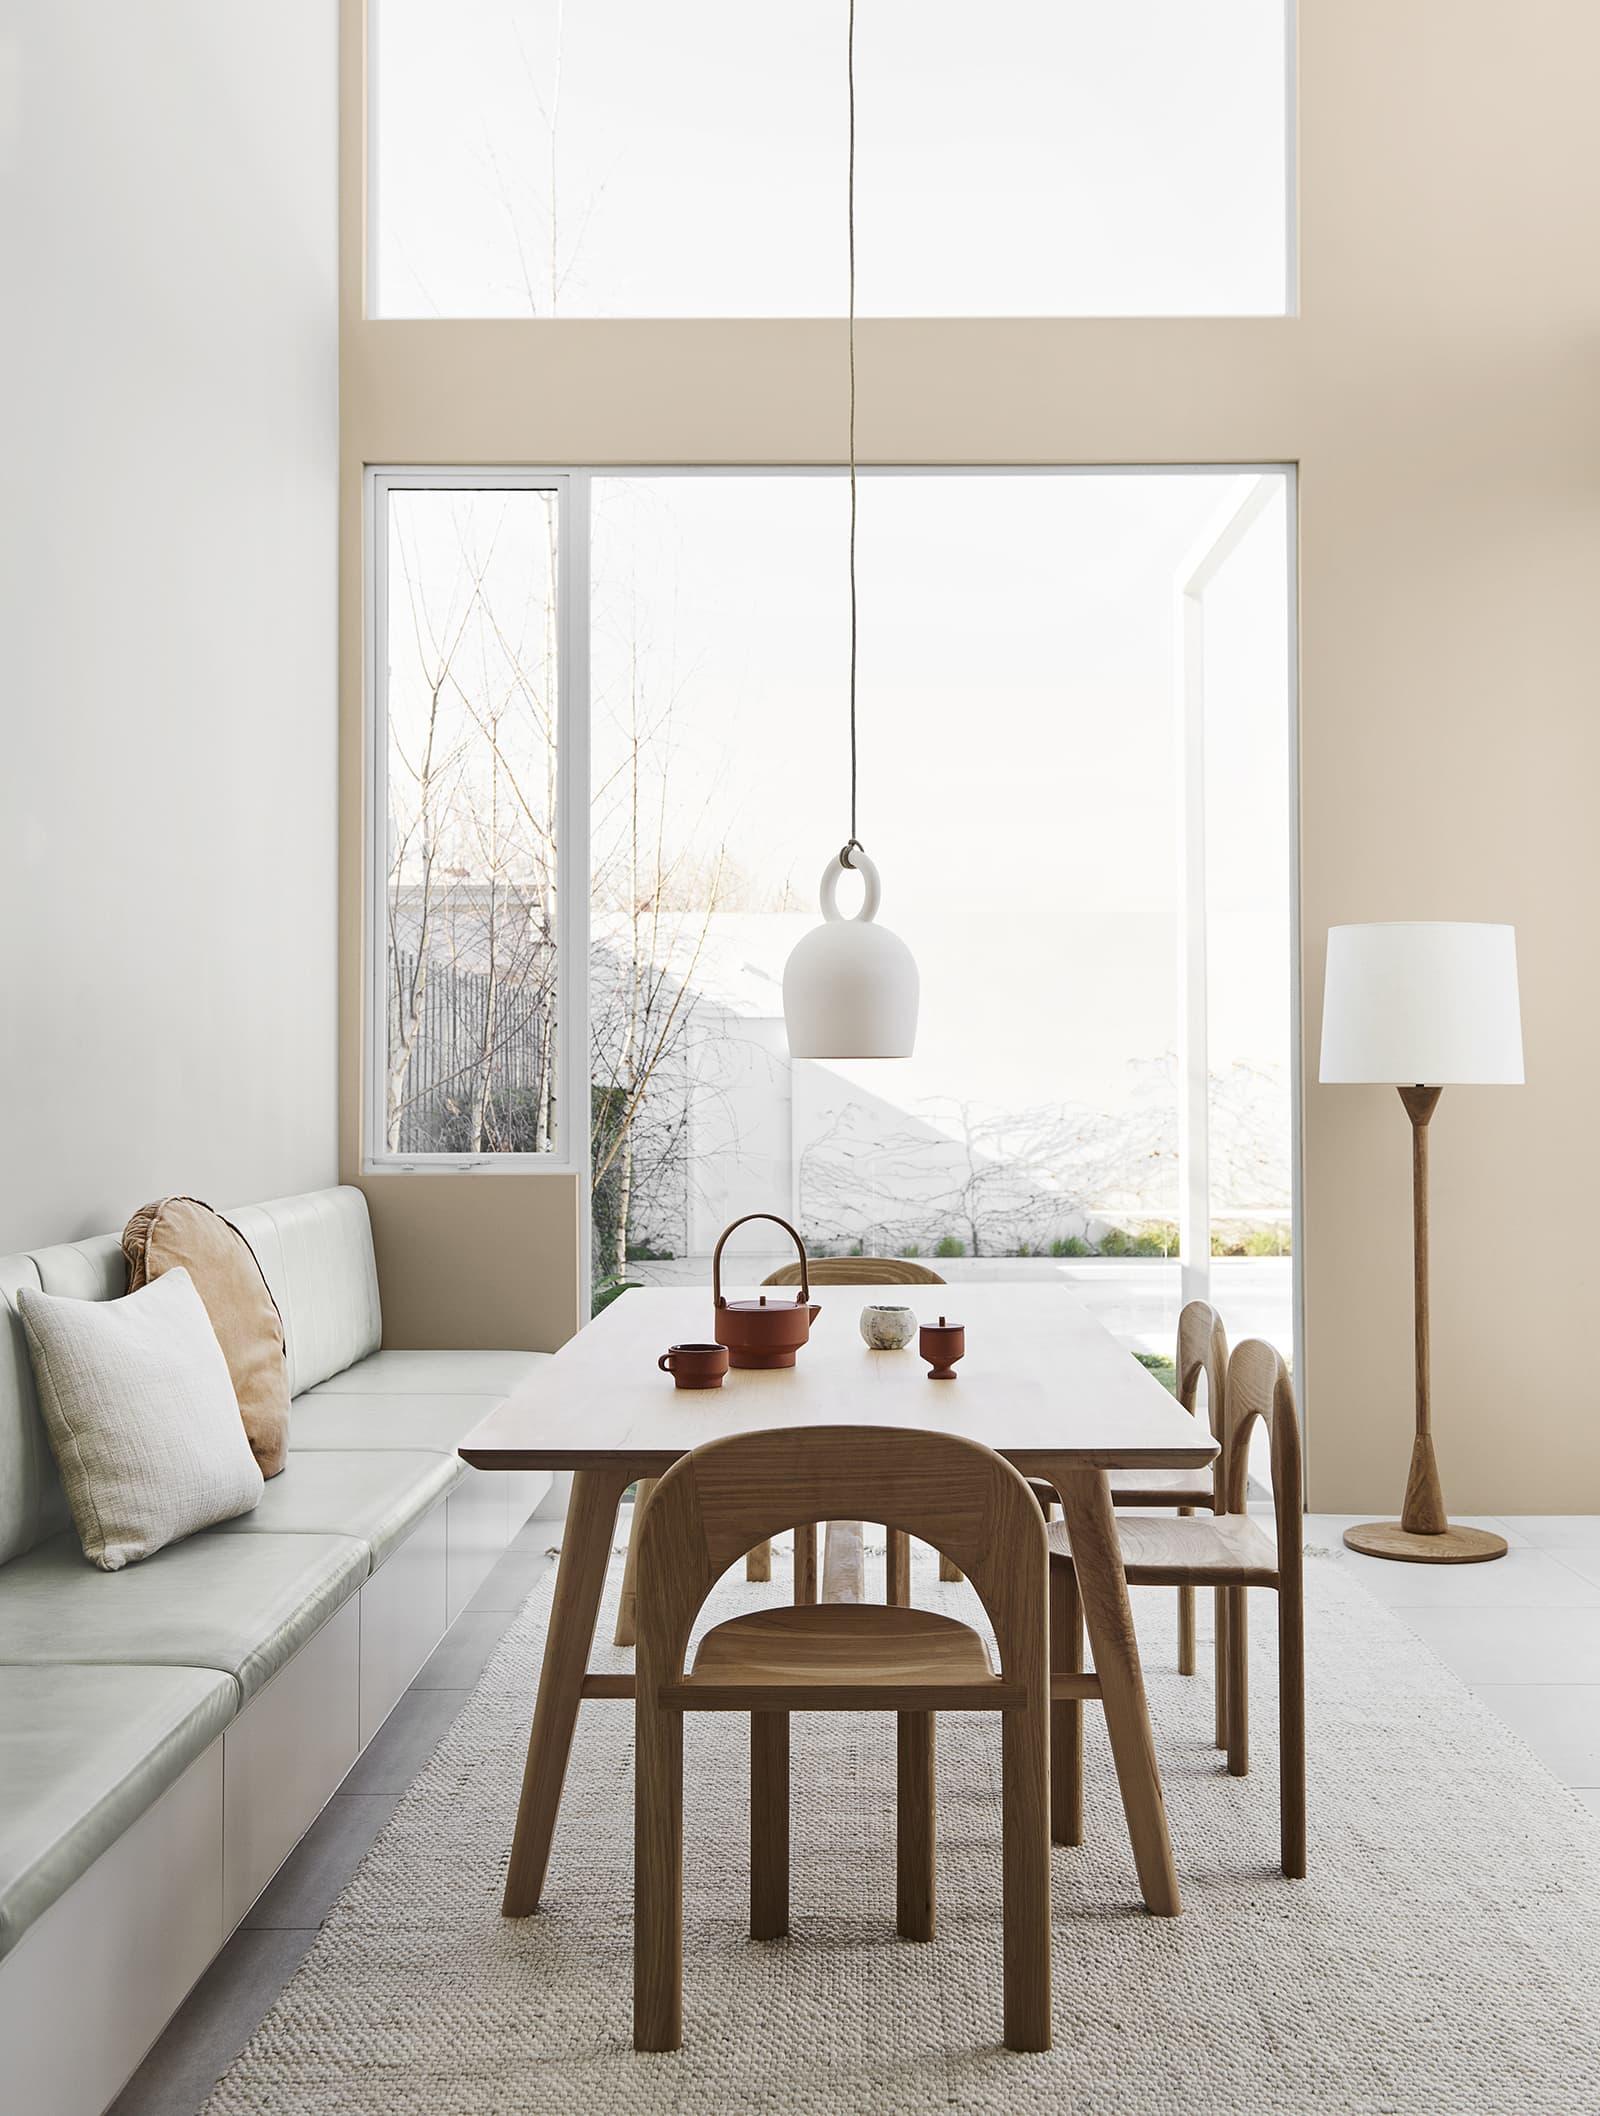 neutral interior design scheme dining room with concrete pendant light over light oak dining table